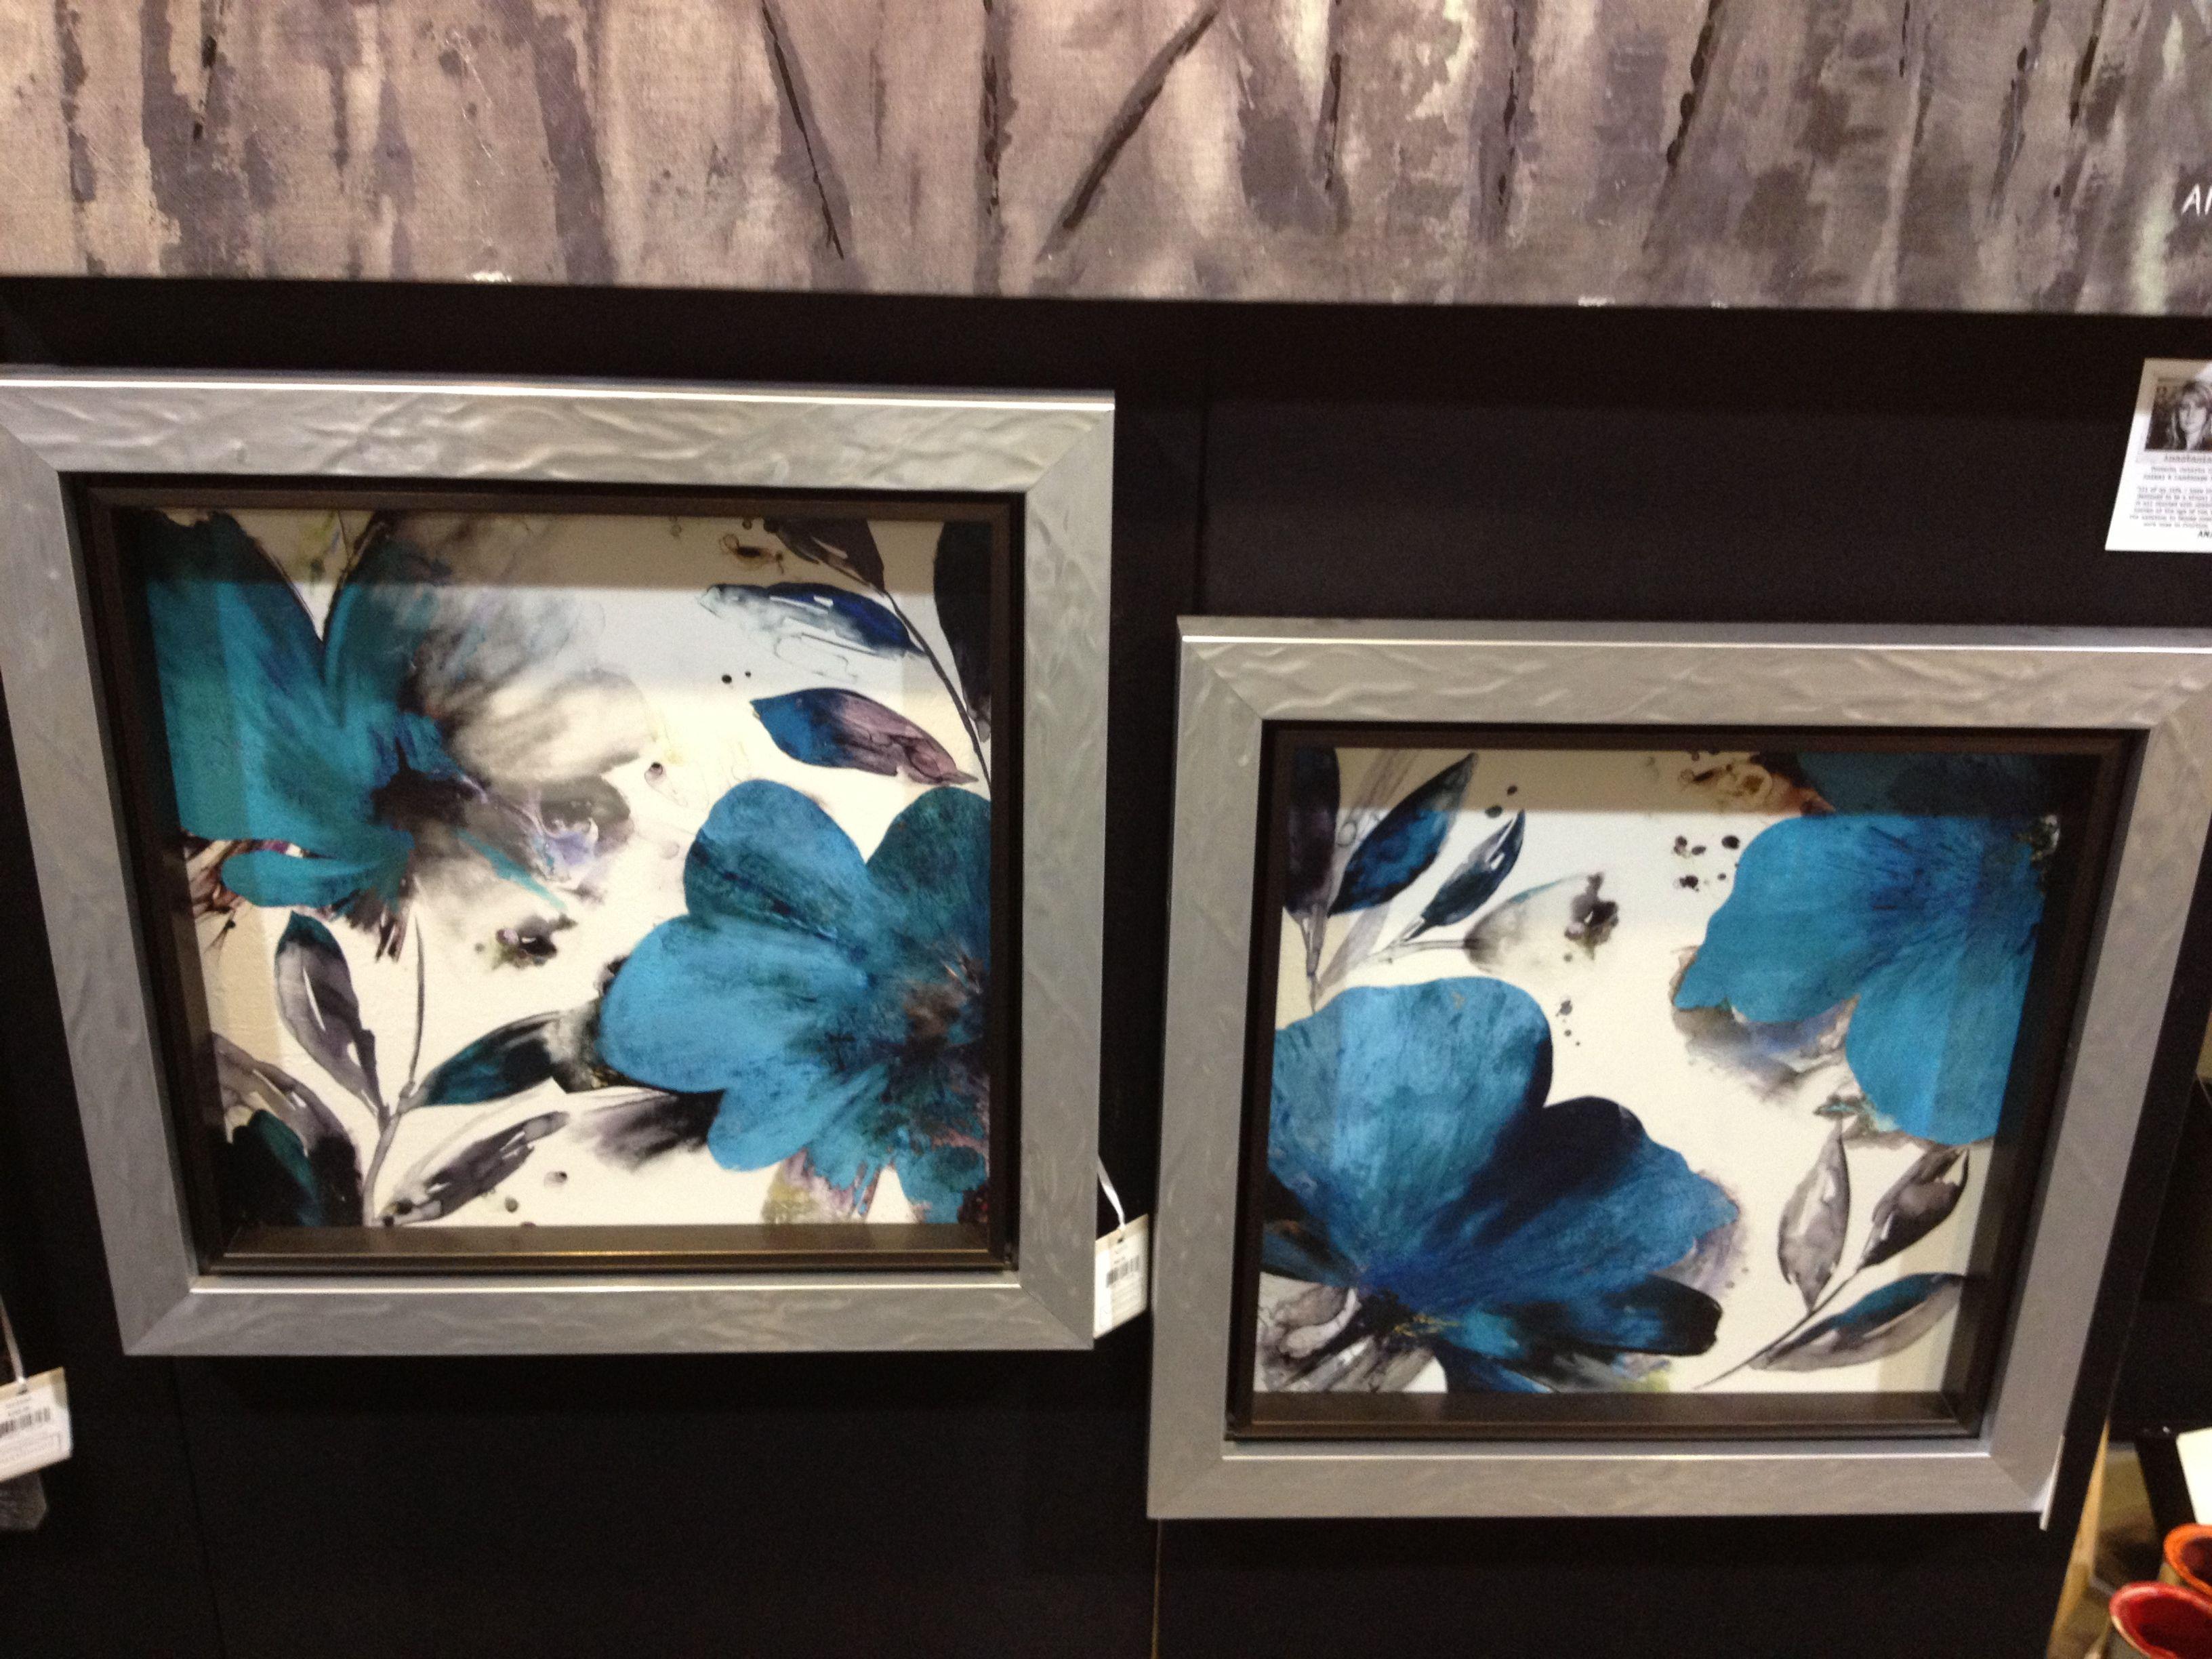 Blue Floral Prints SOLD OUT www.lambertpaint.com